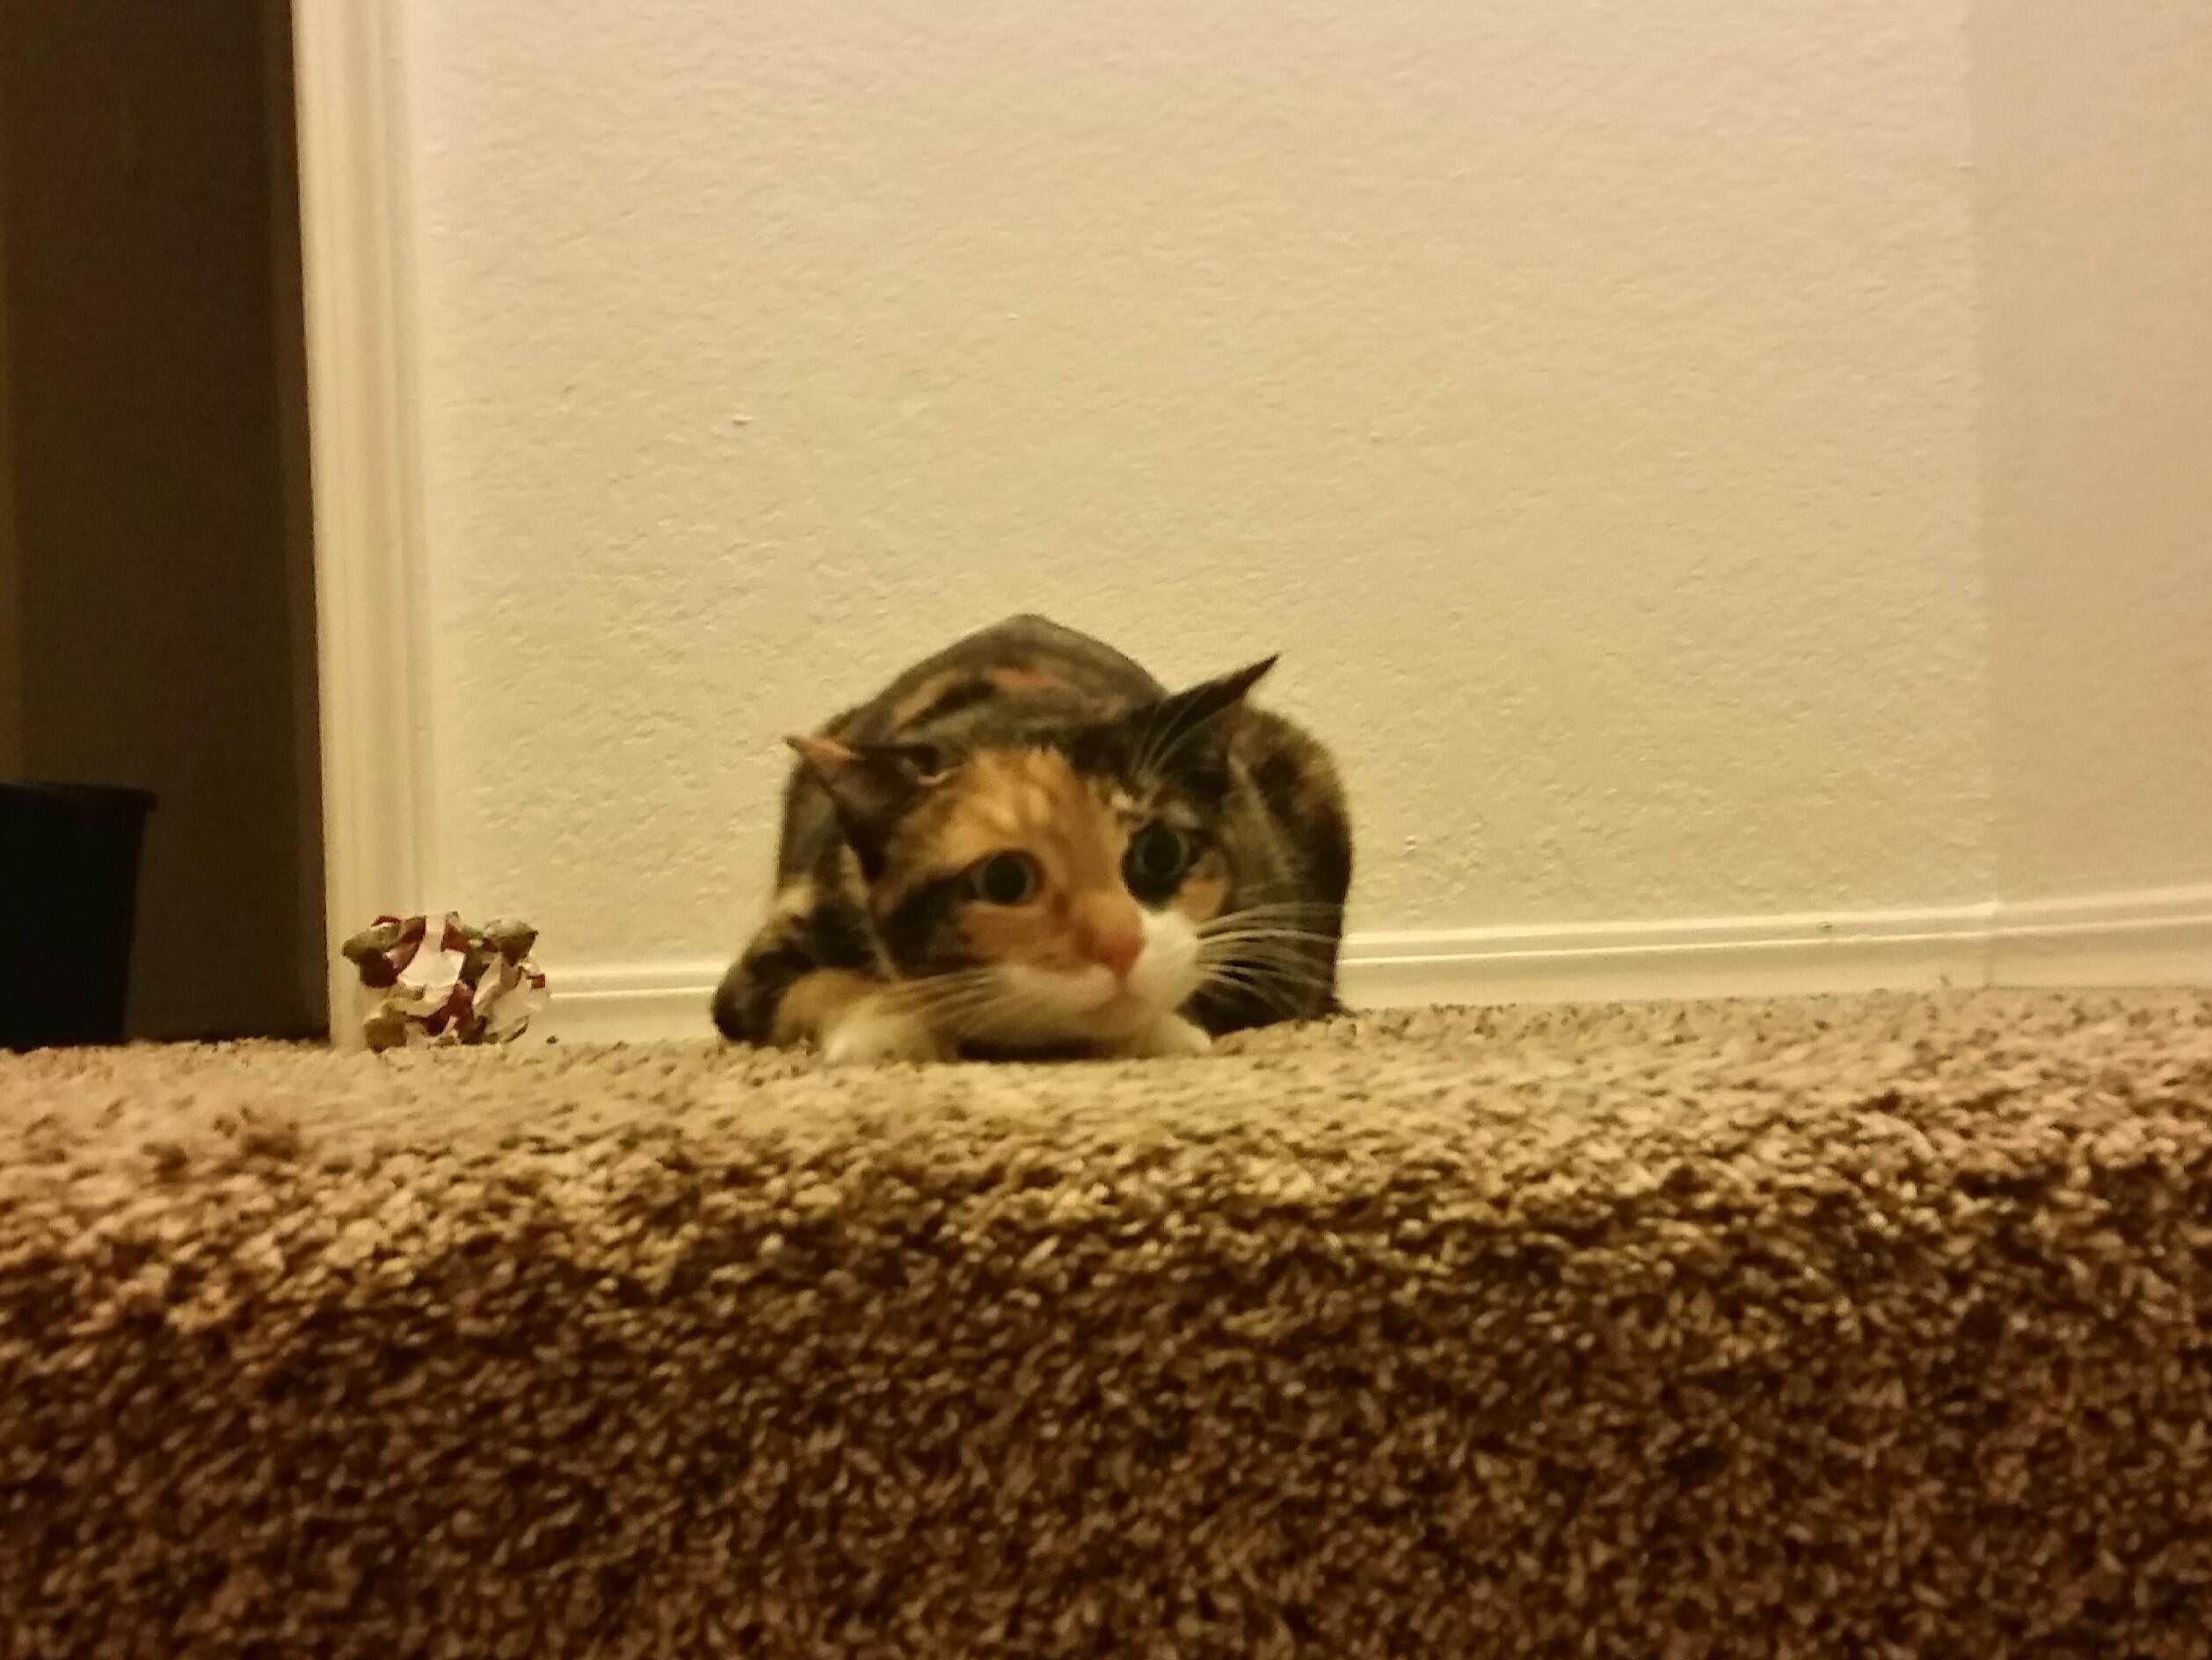 Someone S A Little Sleepy Kitten Cute Cat Sleepy Kitten Sleepy Cat Cat Nap